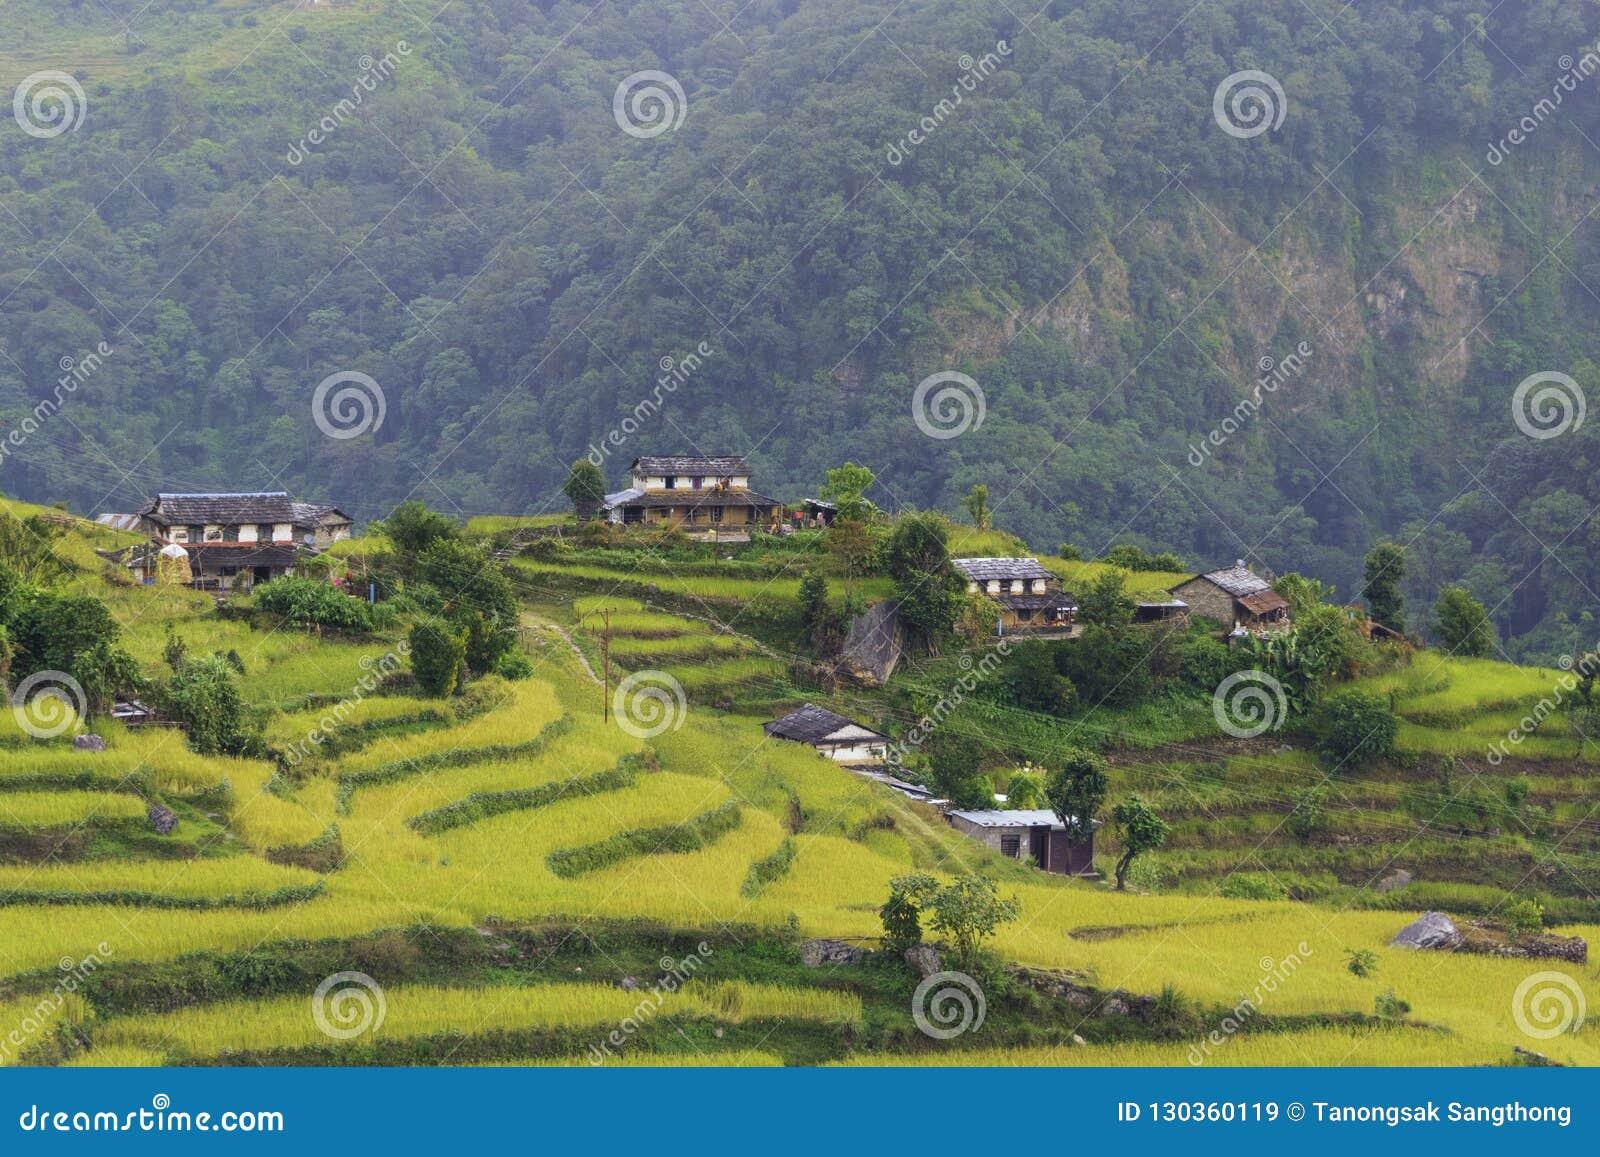 Terrazzi, risaie e villaggi in Himalaya